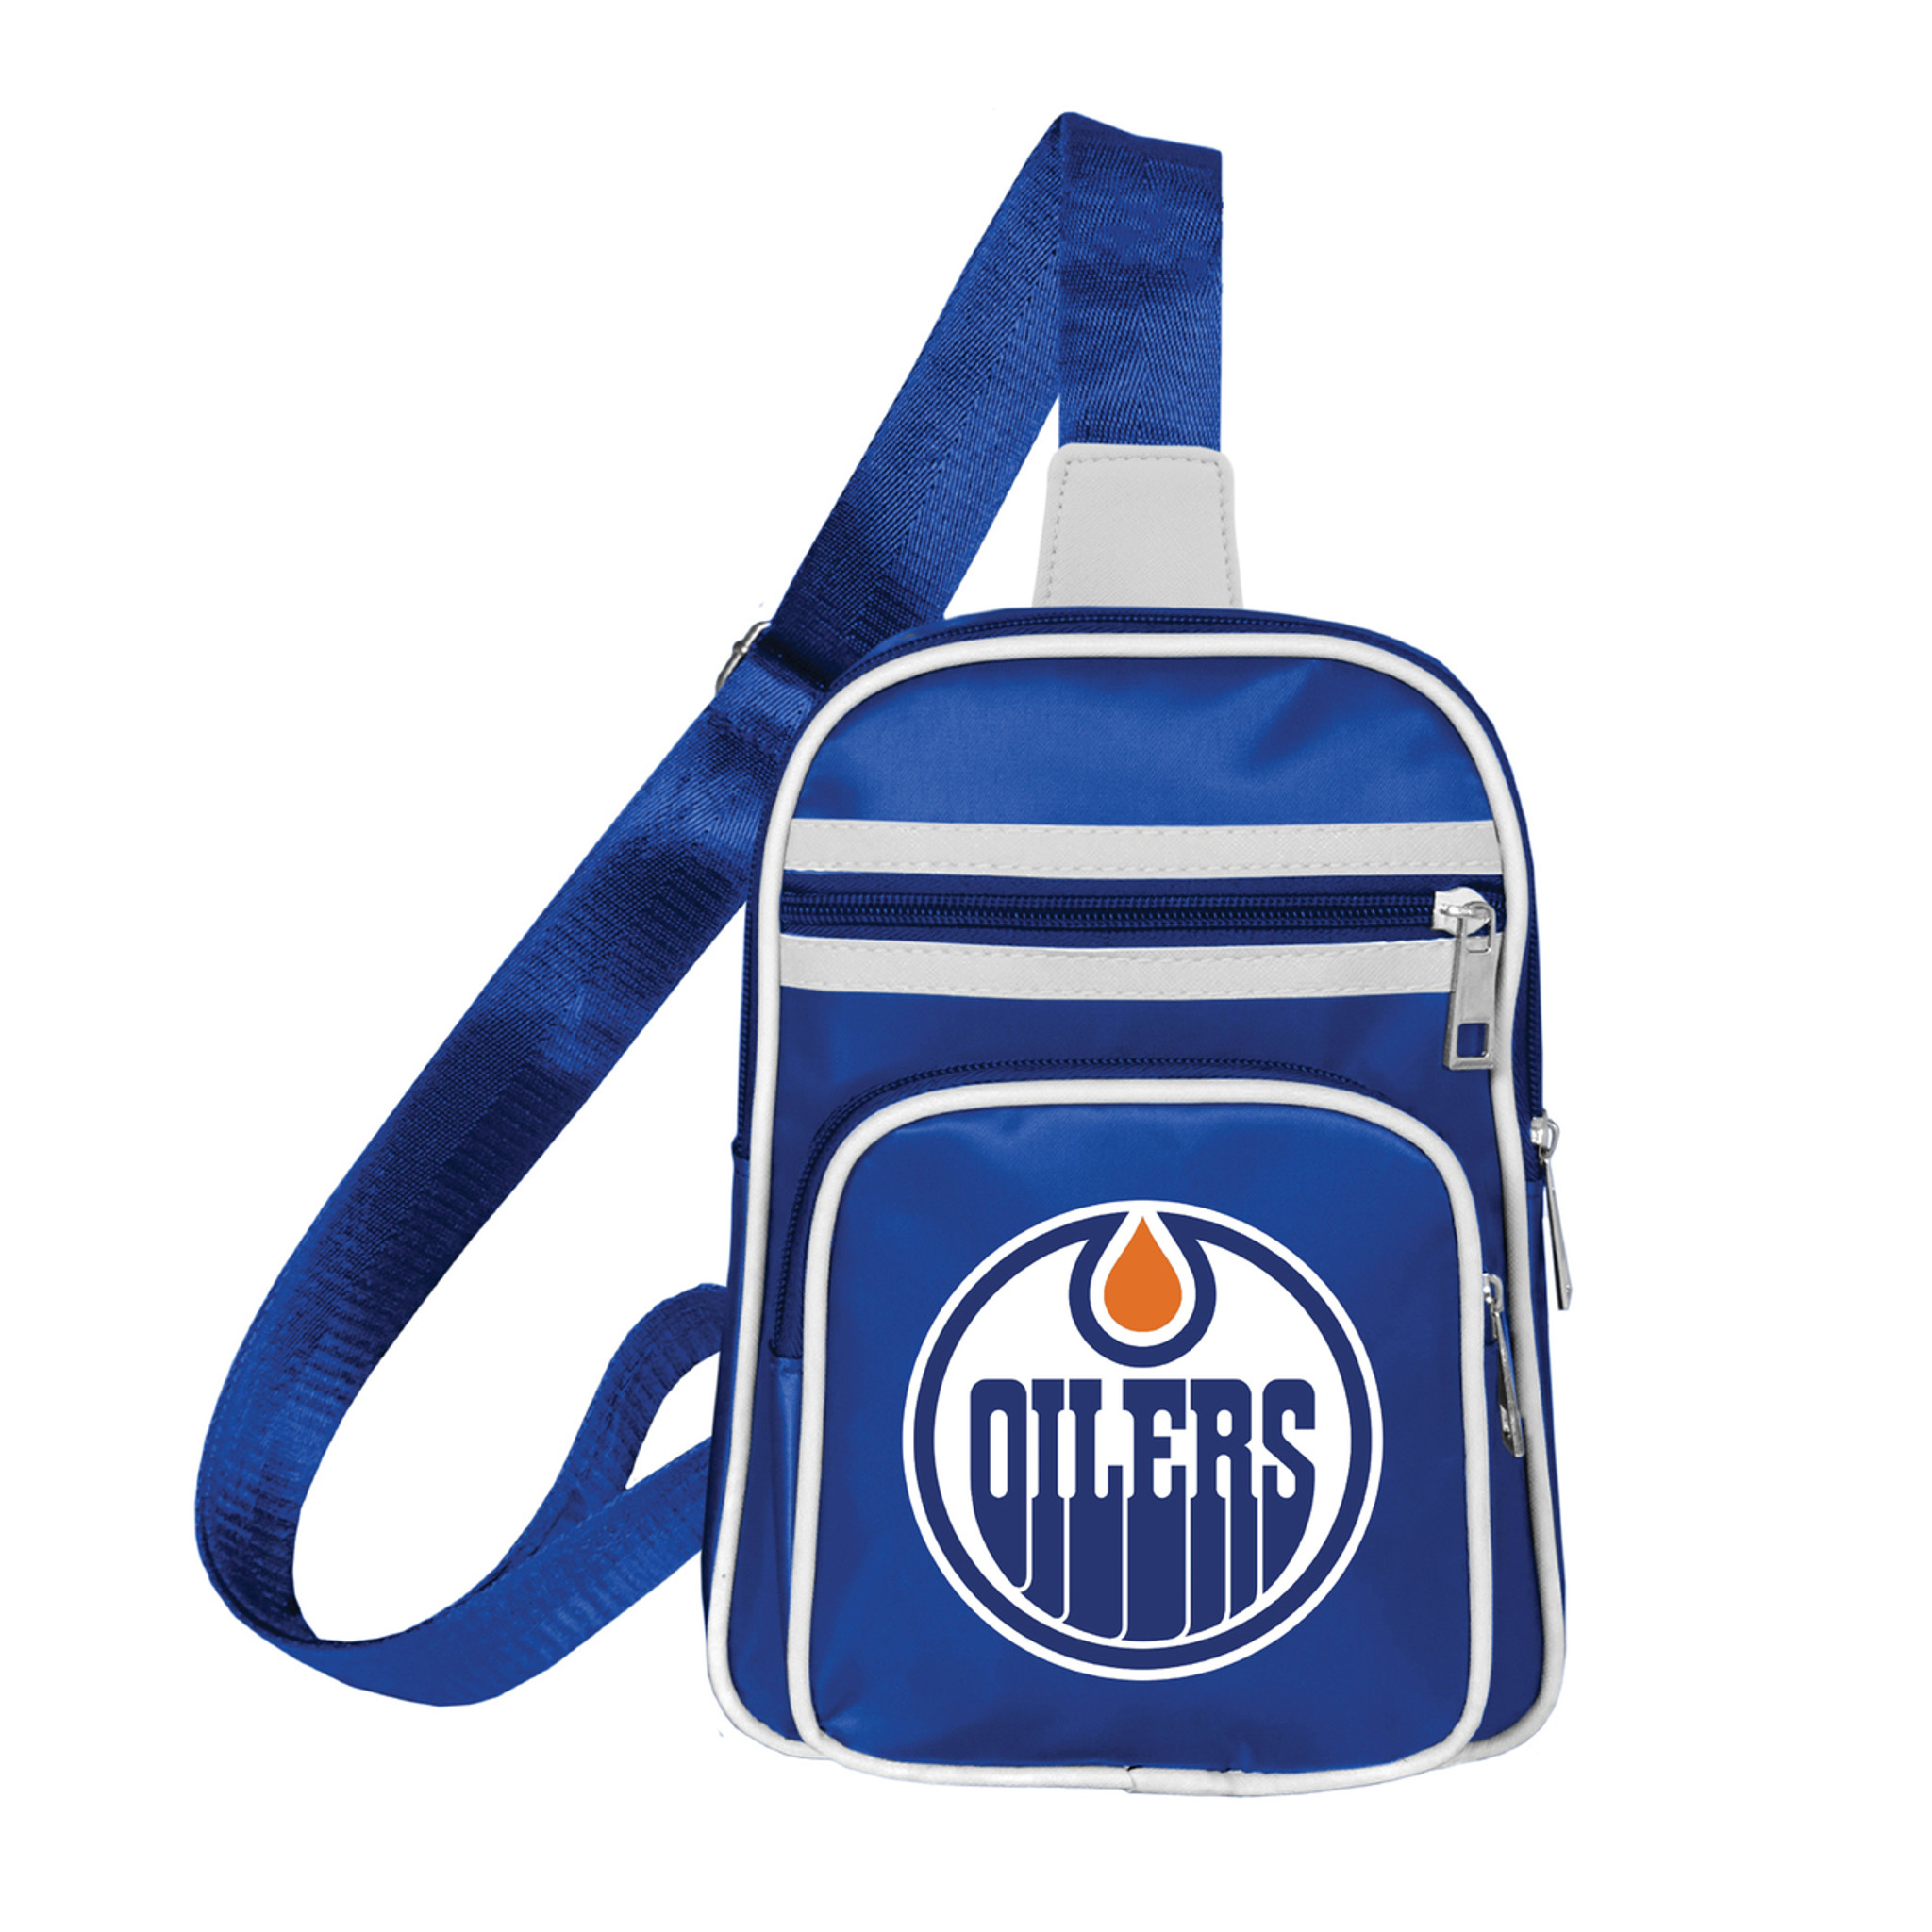 d7f57d383 Edmonton Oilers Mini Cross Purse Sling Bag - Spawty